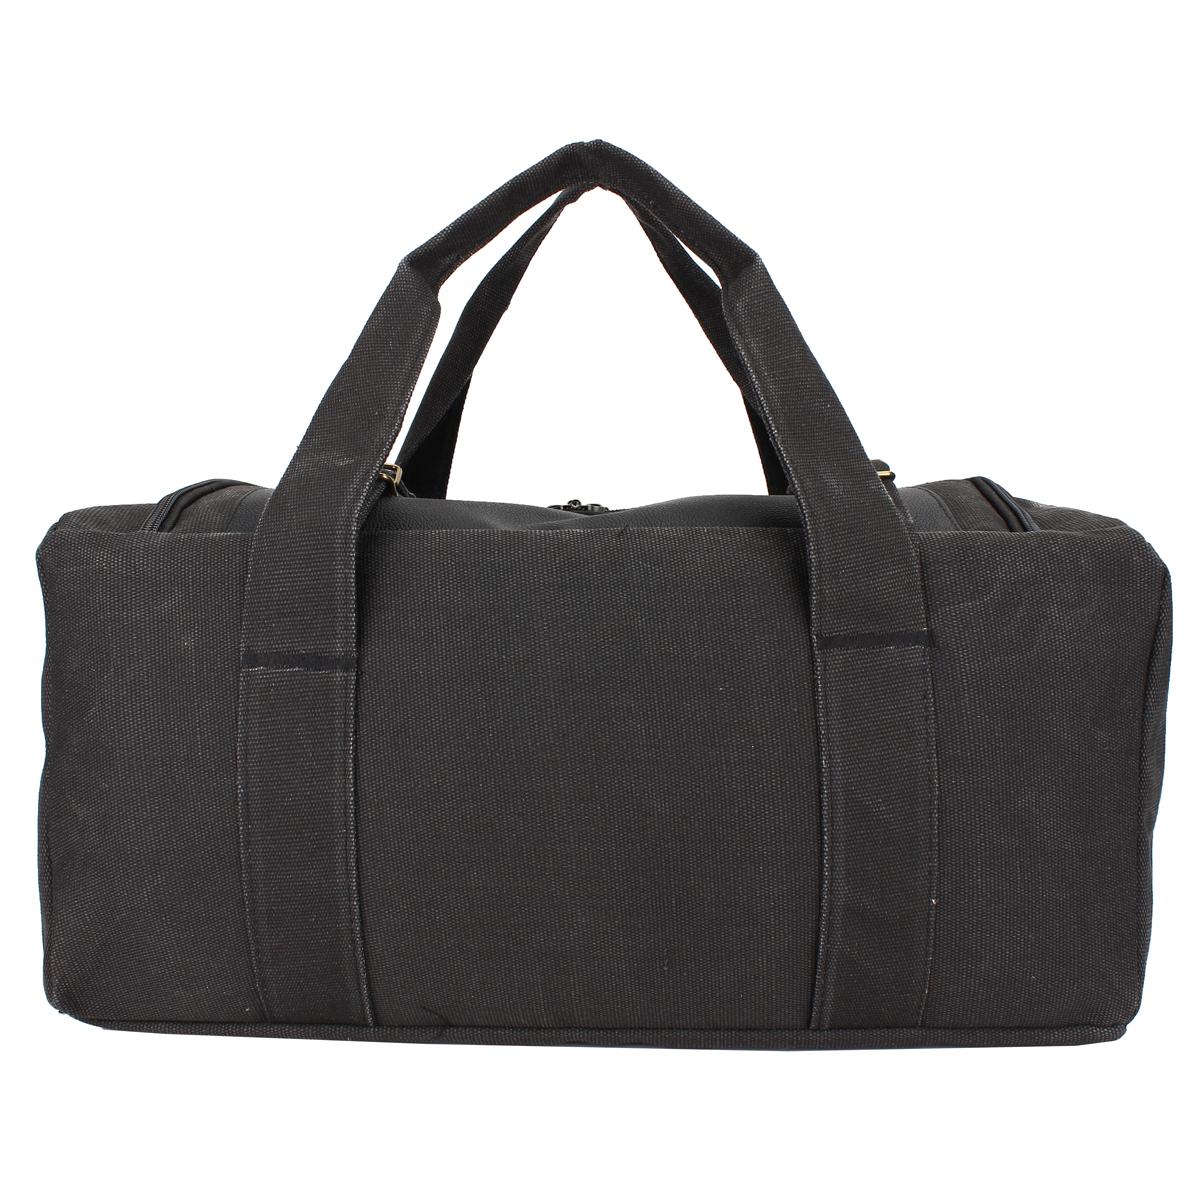 Details about Men Military Canvas Gym Duffle Large Shoulder Bag Outdoor Travel  Luggage Handbag ef7b05305fa4e